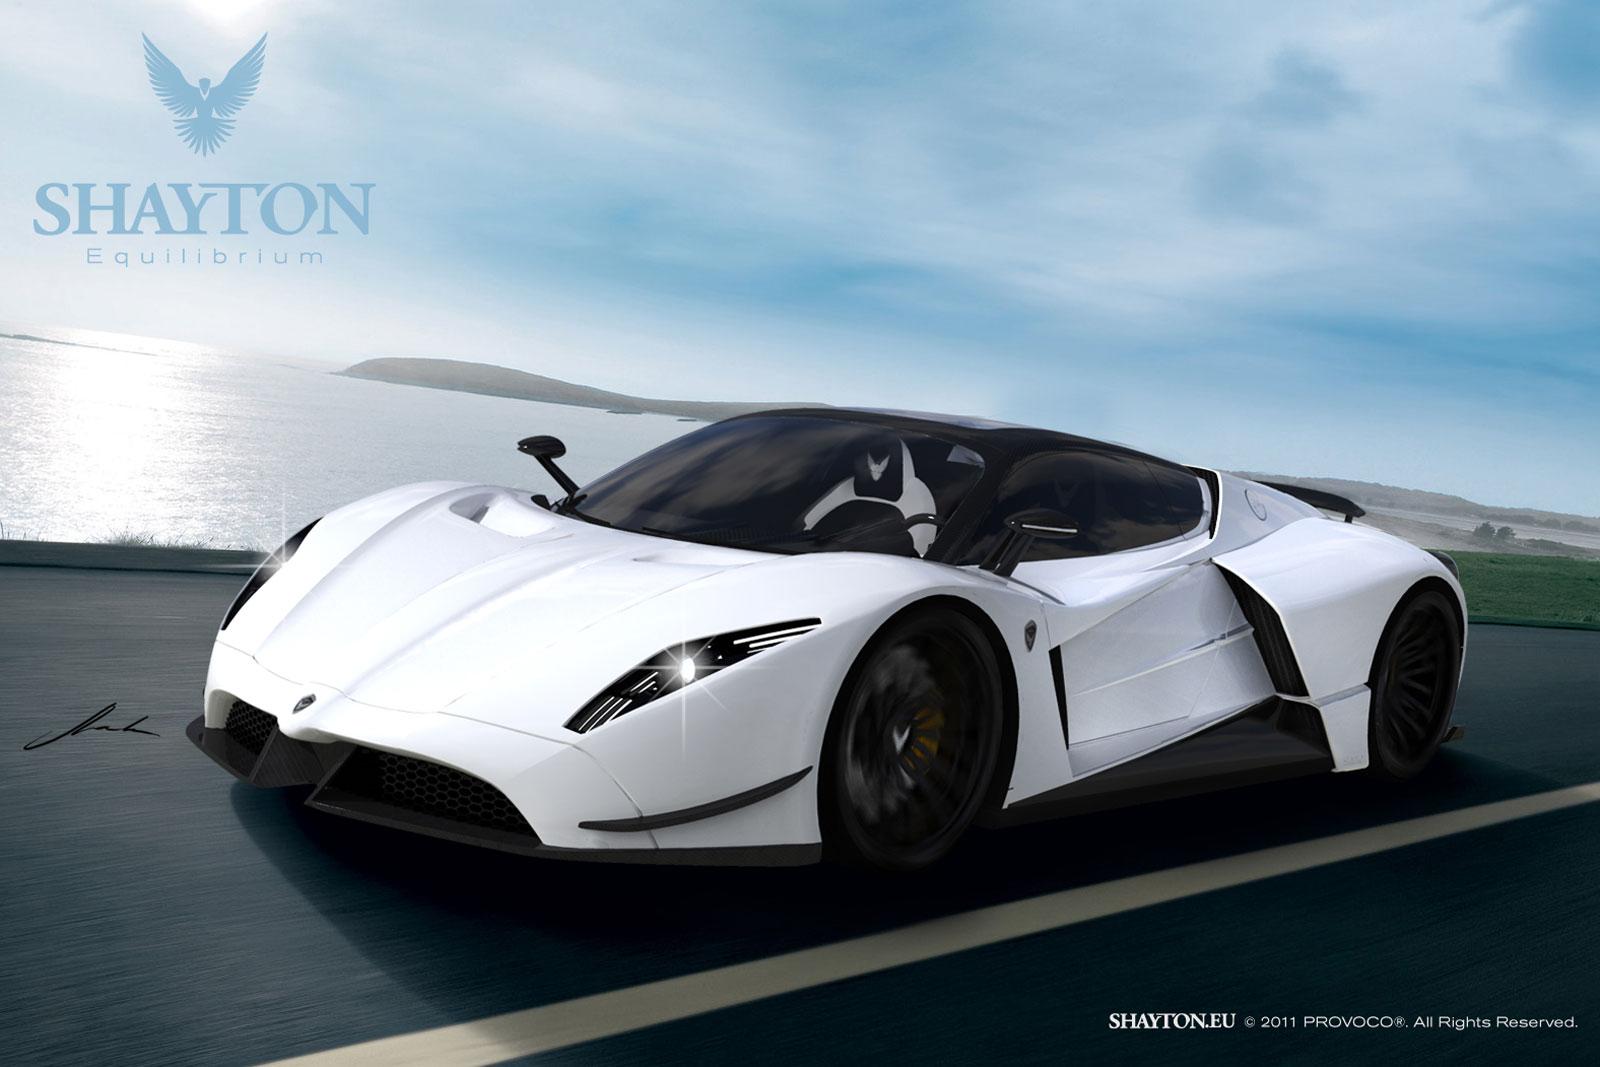 Shayton Equilibrium - New Slovenian Supercar - ForceGT.com